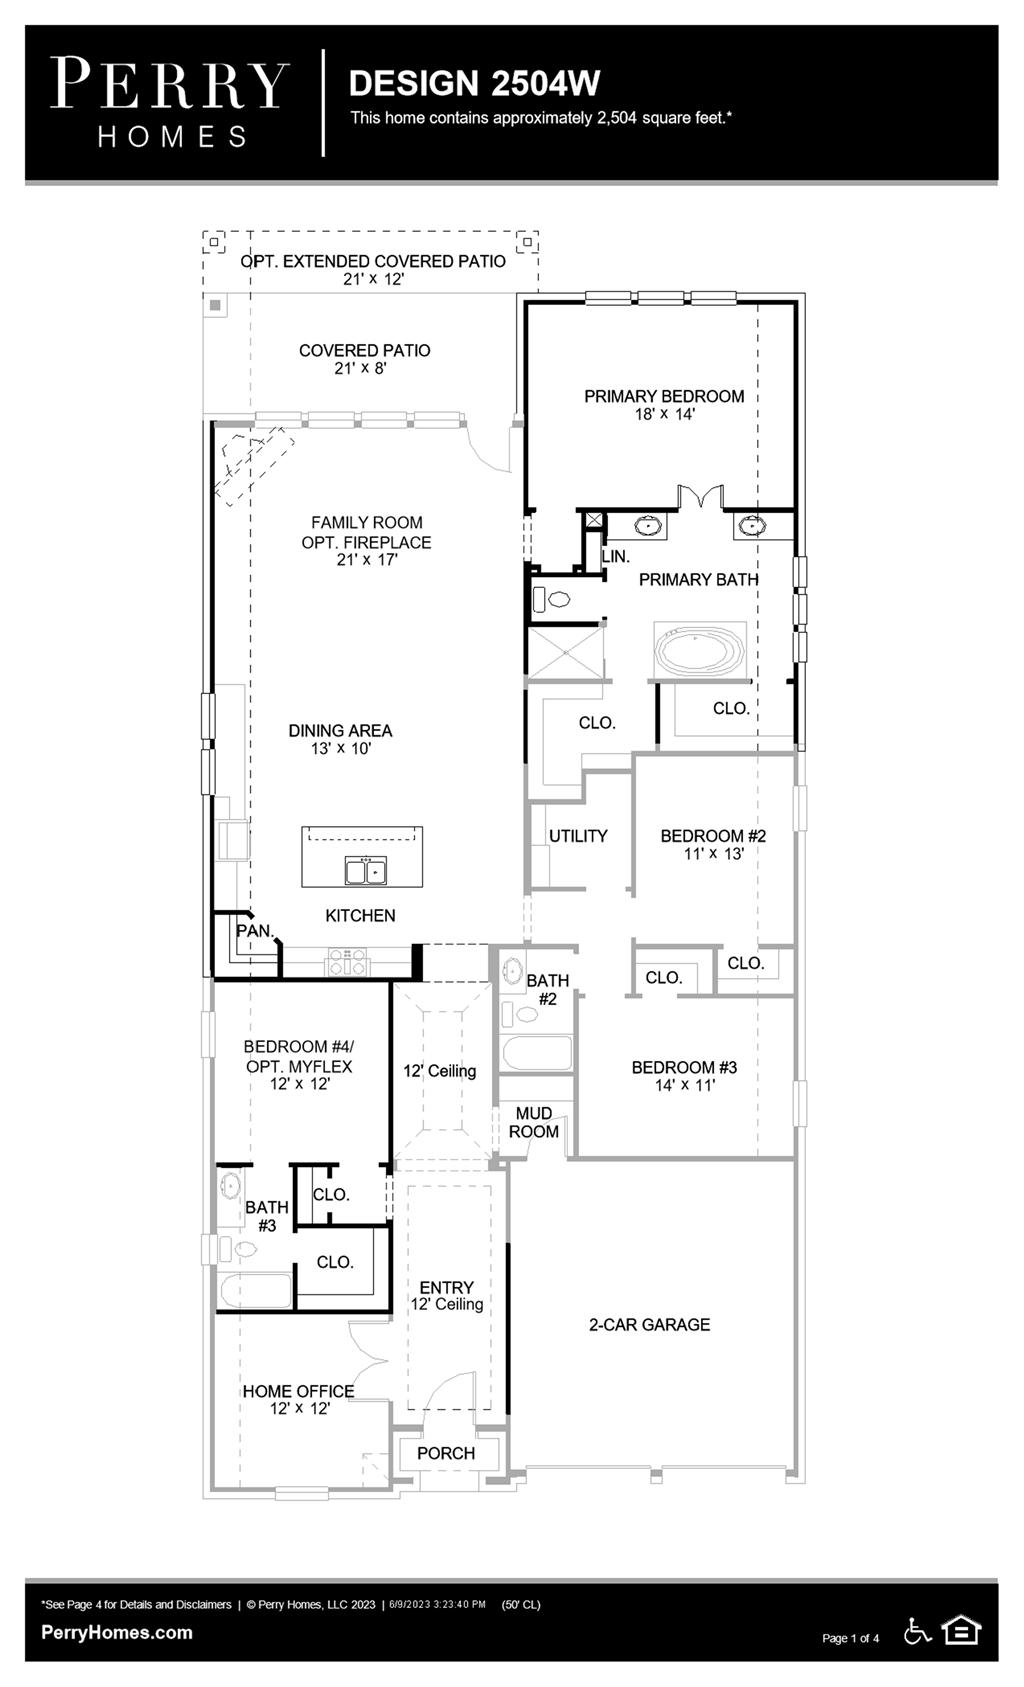 Floor Plan for 2504W